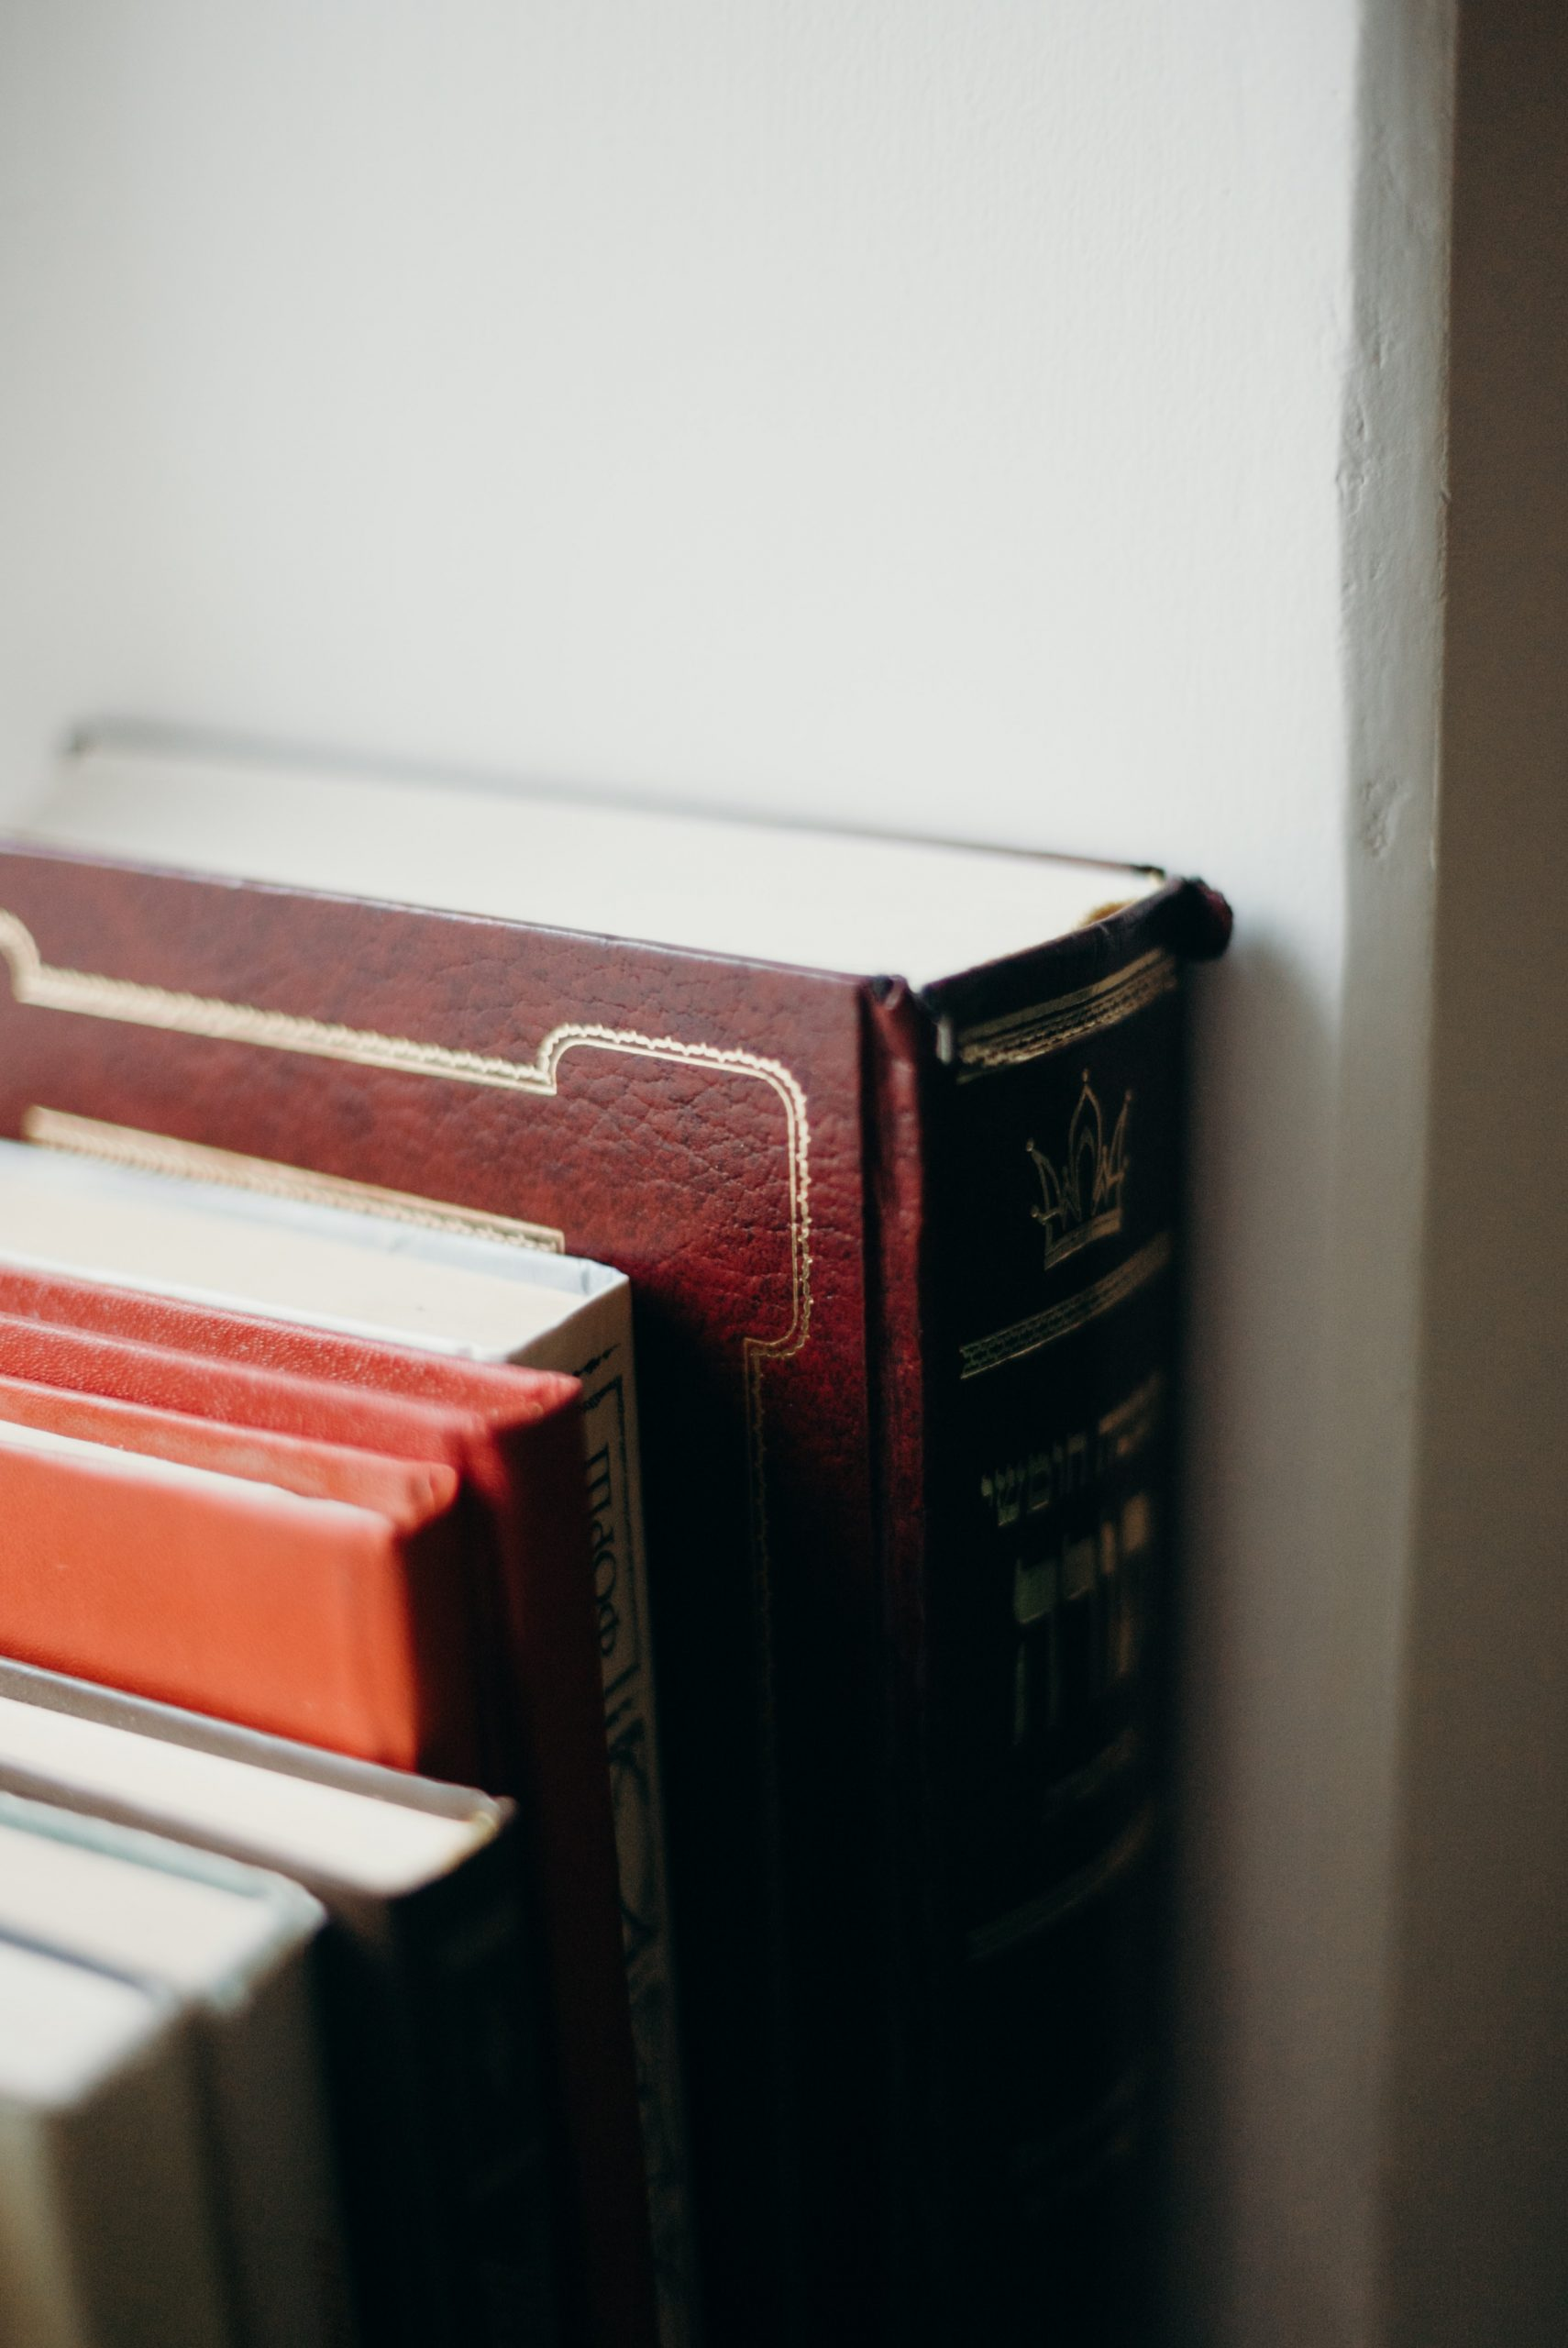 Books on sehlf